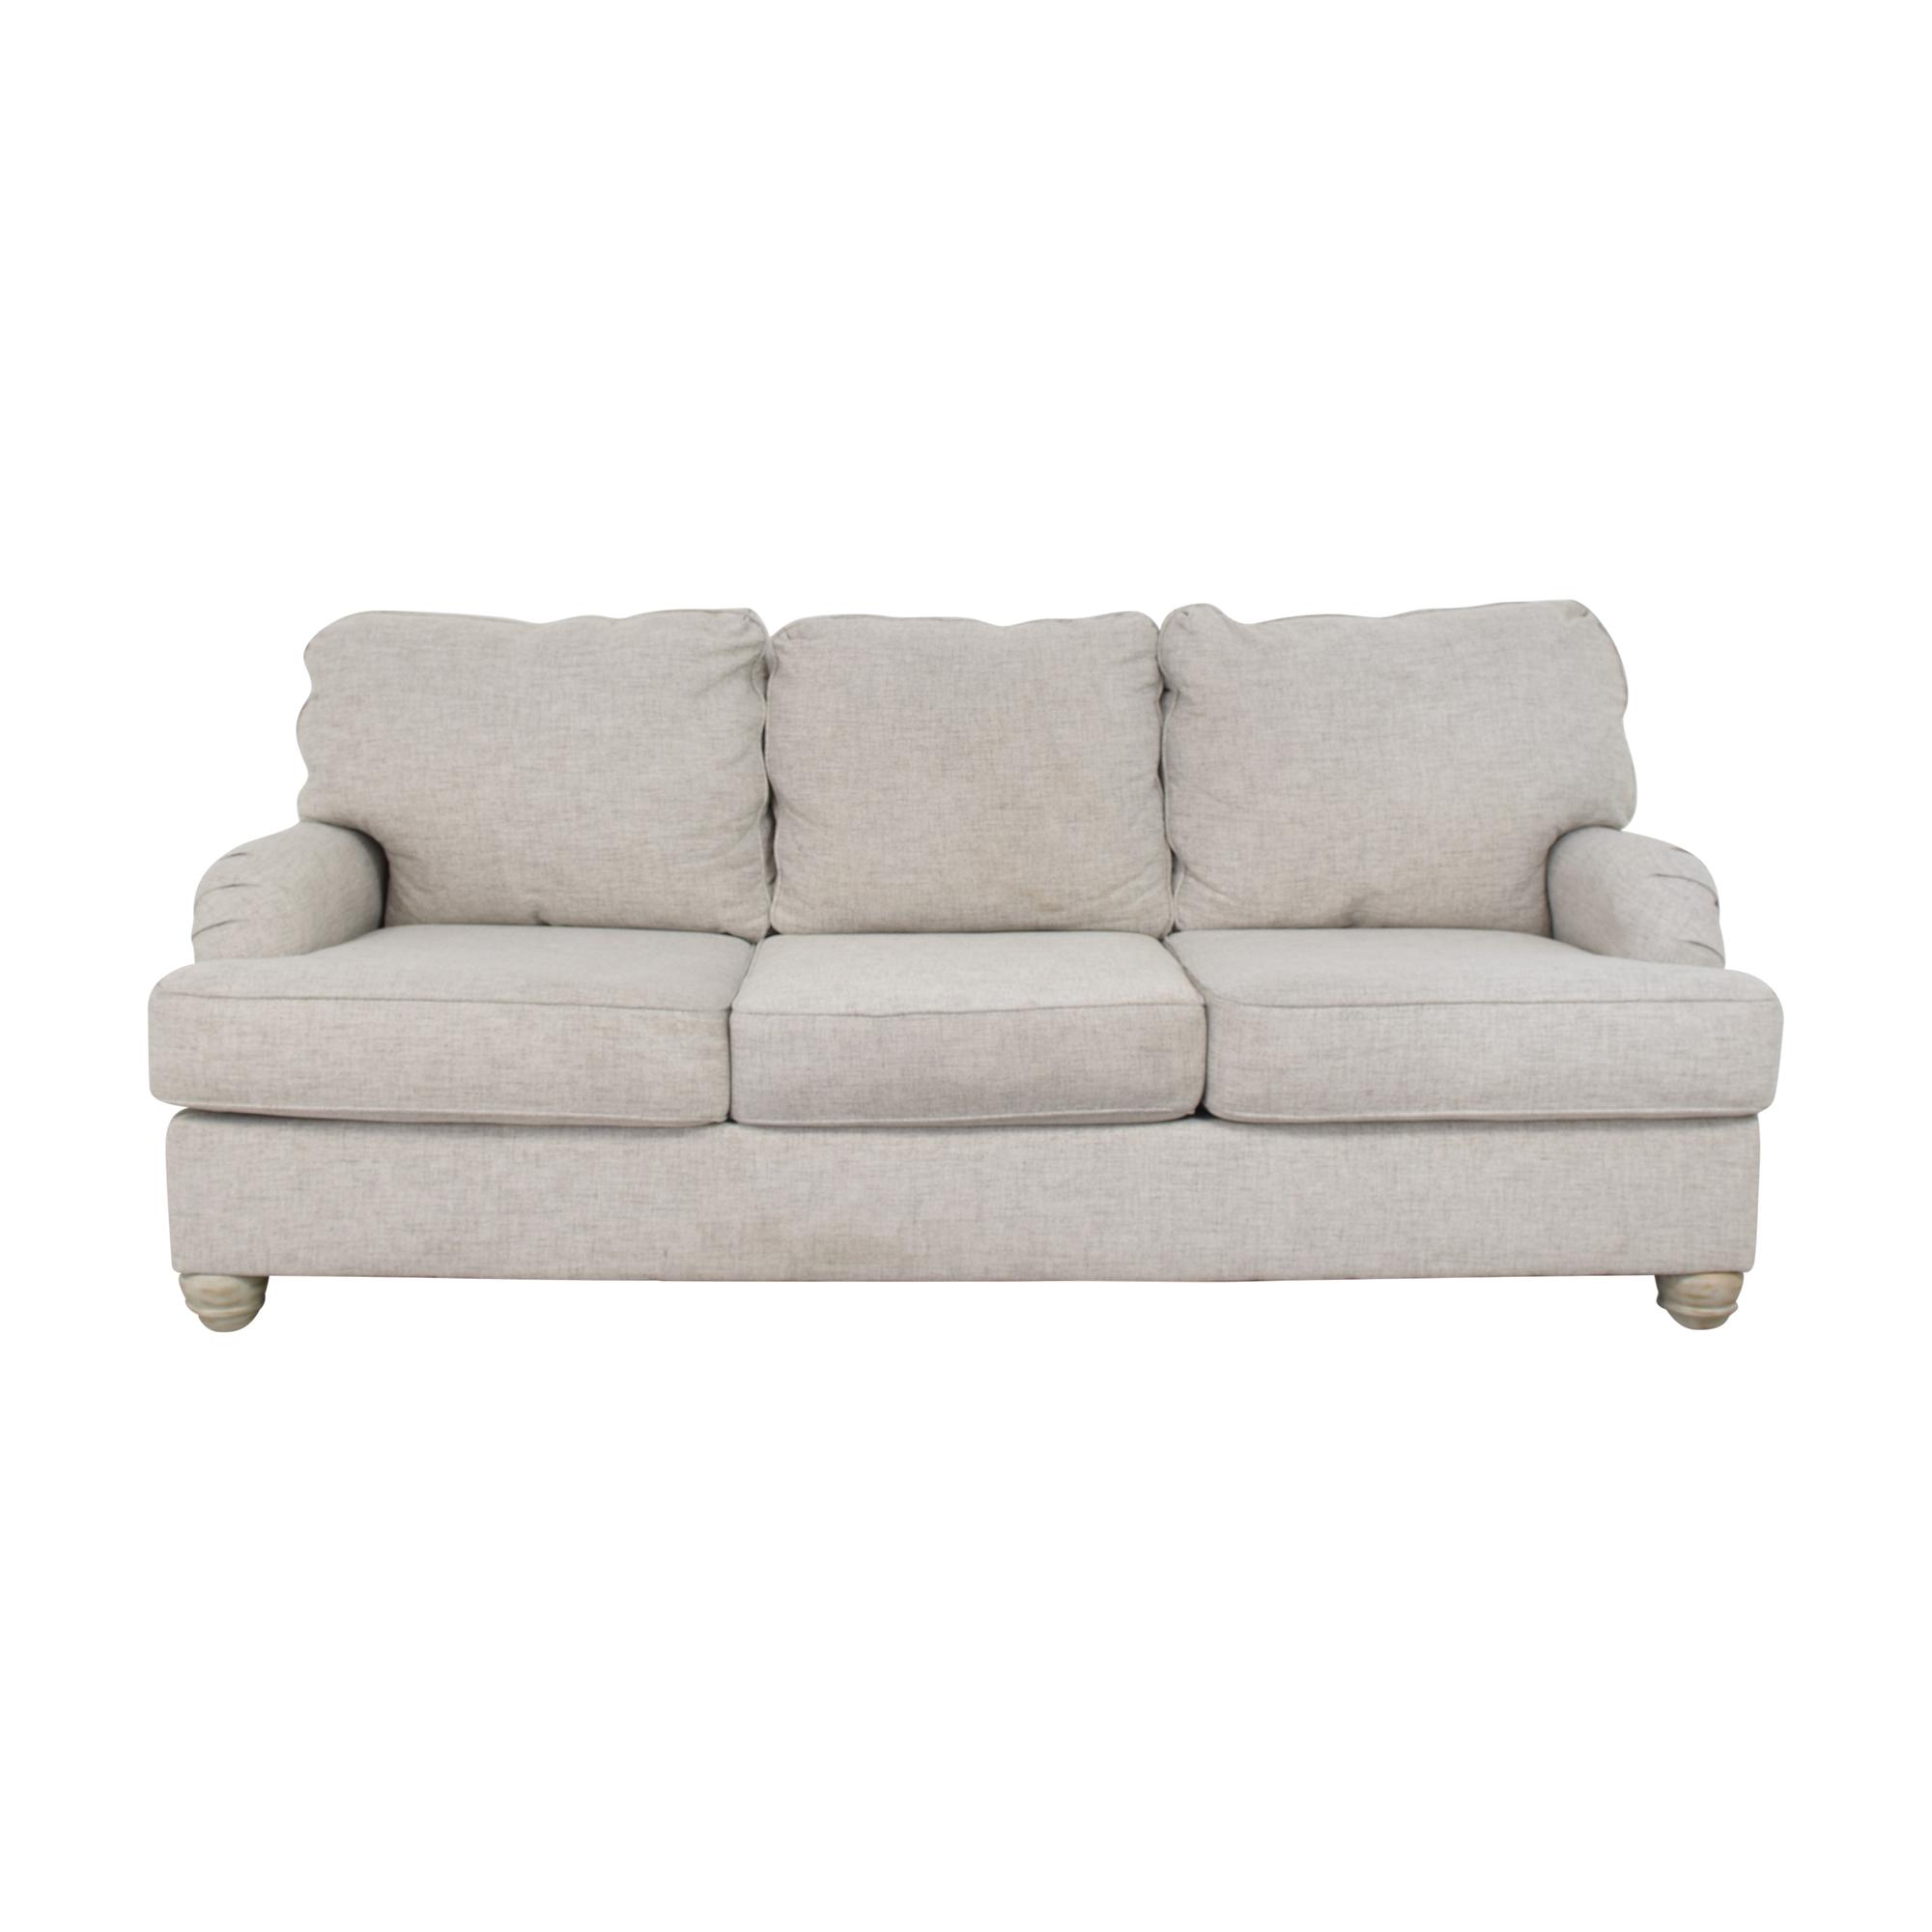 Raymour & Flanigan Trixie Sofa / Classic Sofas